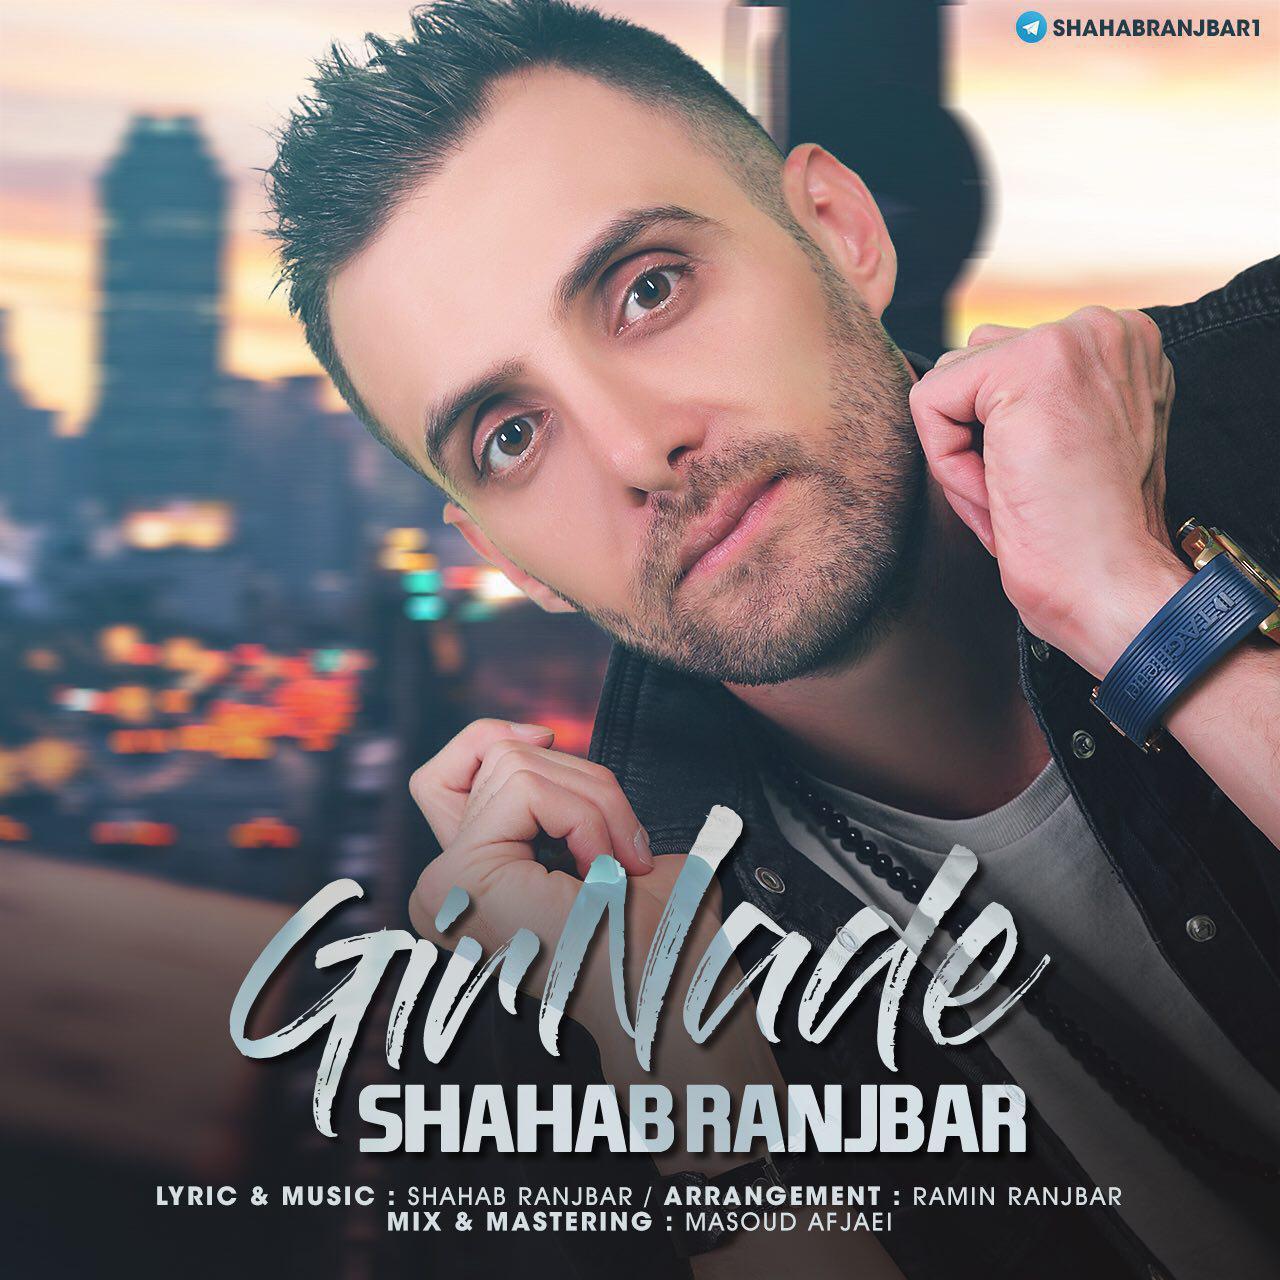 Shahab Ranjbar – Gir Nade